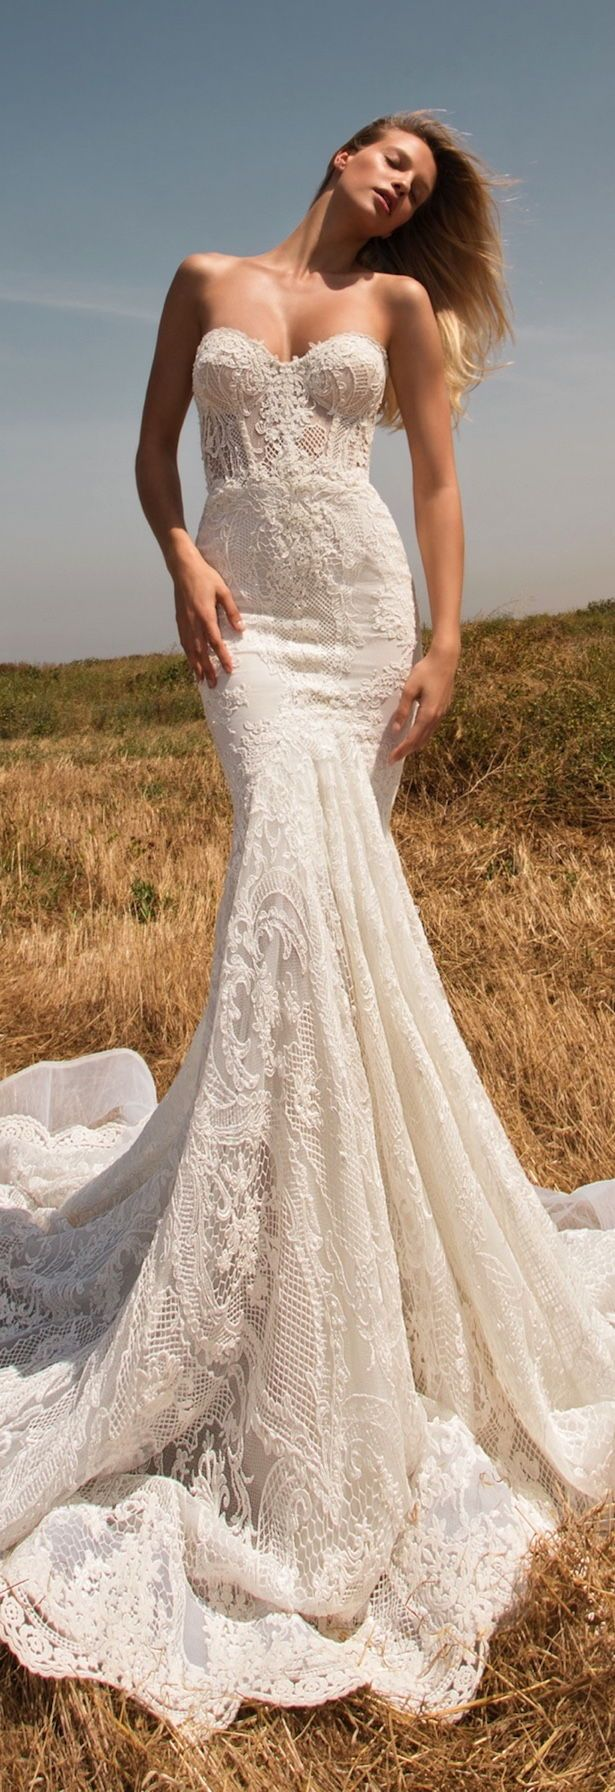 Gala 704 Collection No Ii Bridal Dresses Galia Lahav Tight Wedding Dress Wedding Dresses Corset Mermaid Dresses [ 1792 x 615 Pixel ]